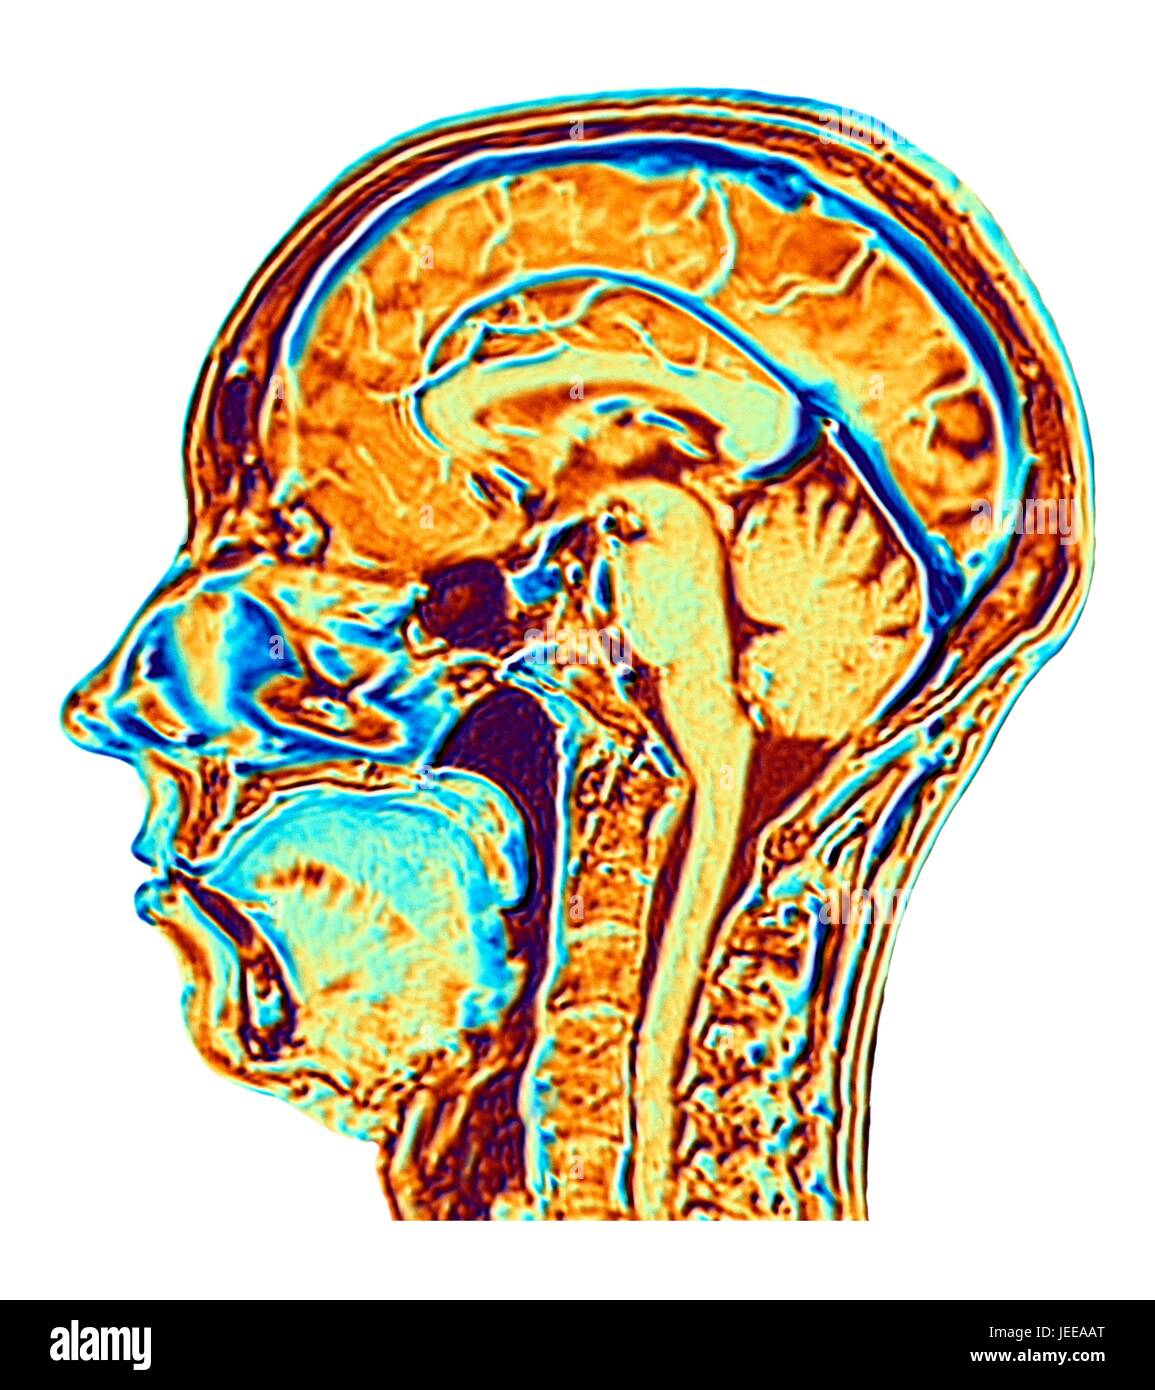 Nmr Brain Scan Stockfotos & Nmr Brain Scan Bilder - Alamy